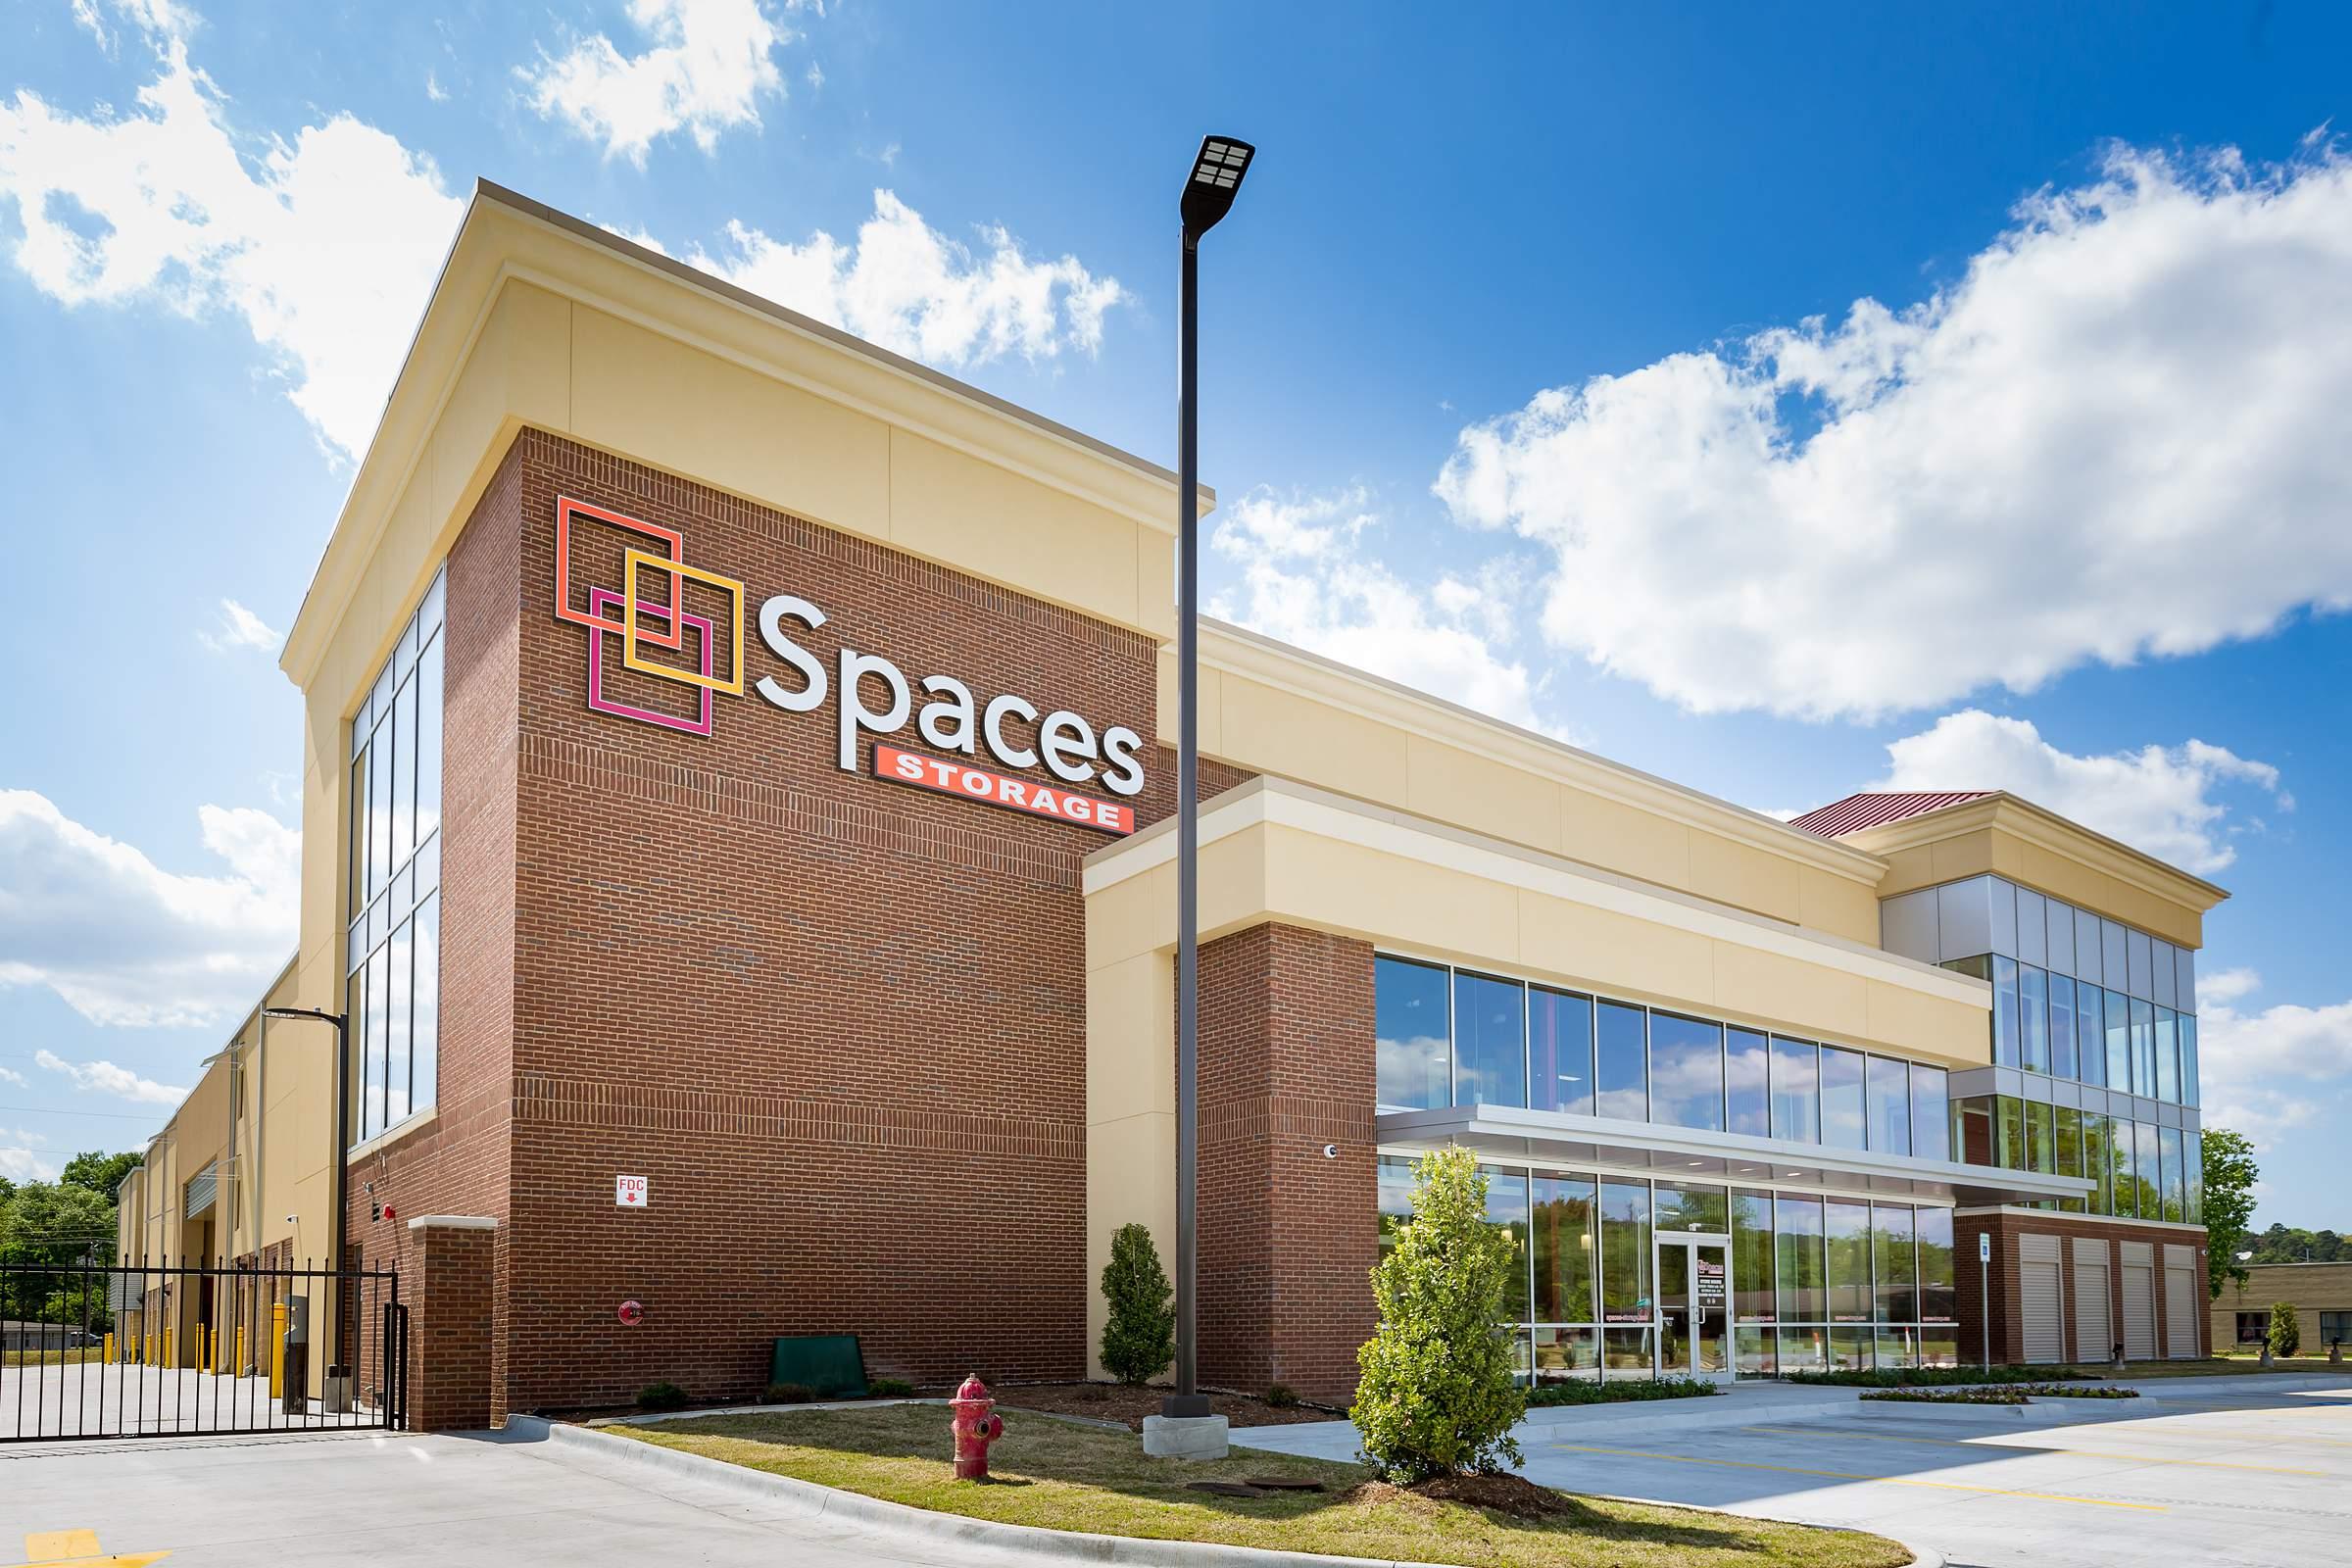 storage facility marketing virtual tours for website google maps